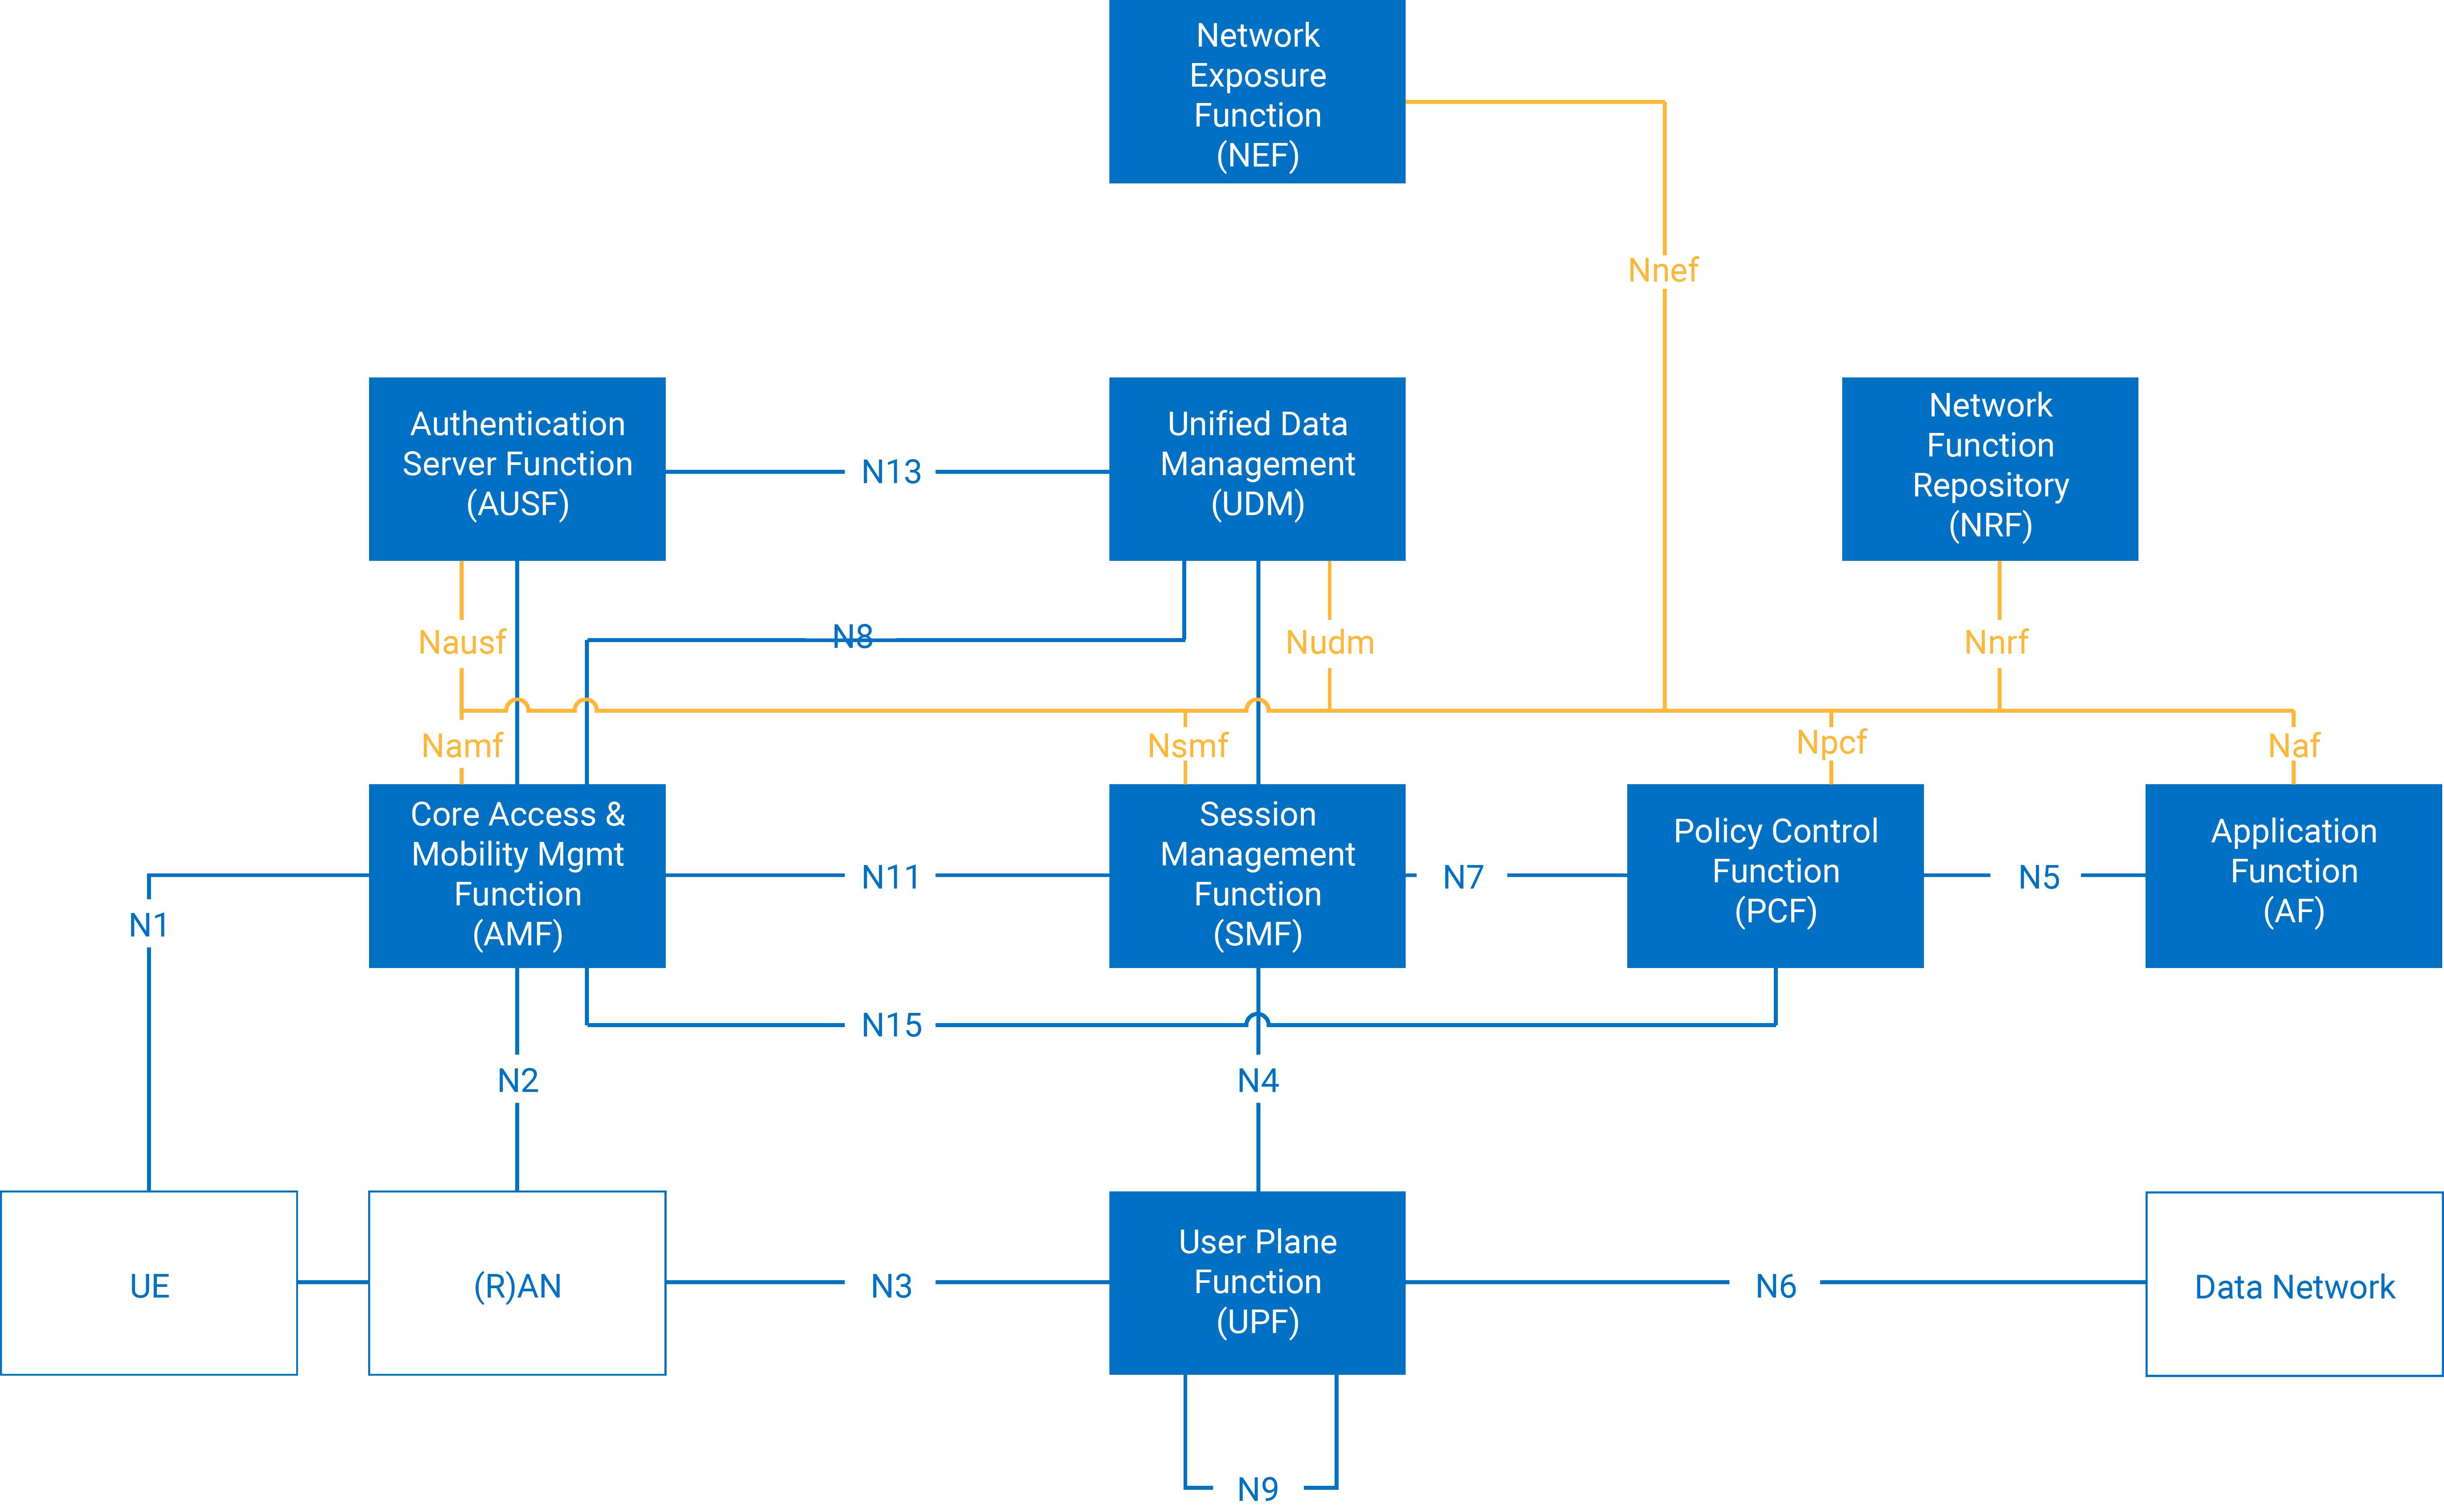 3GPP Architecture